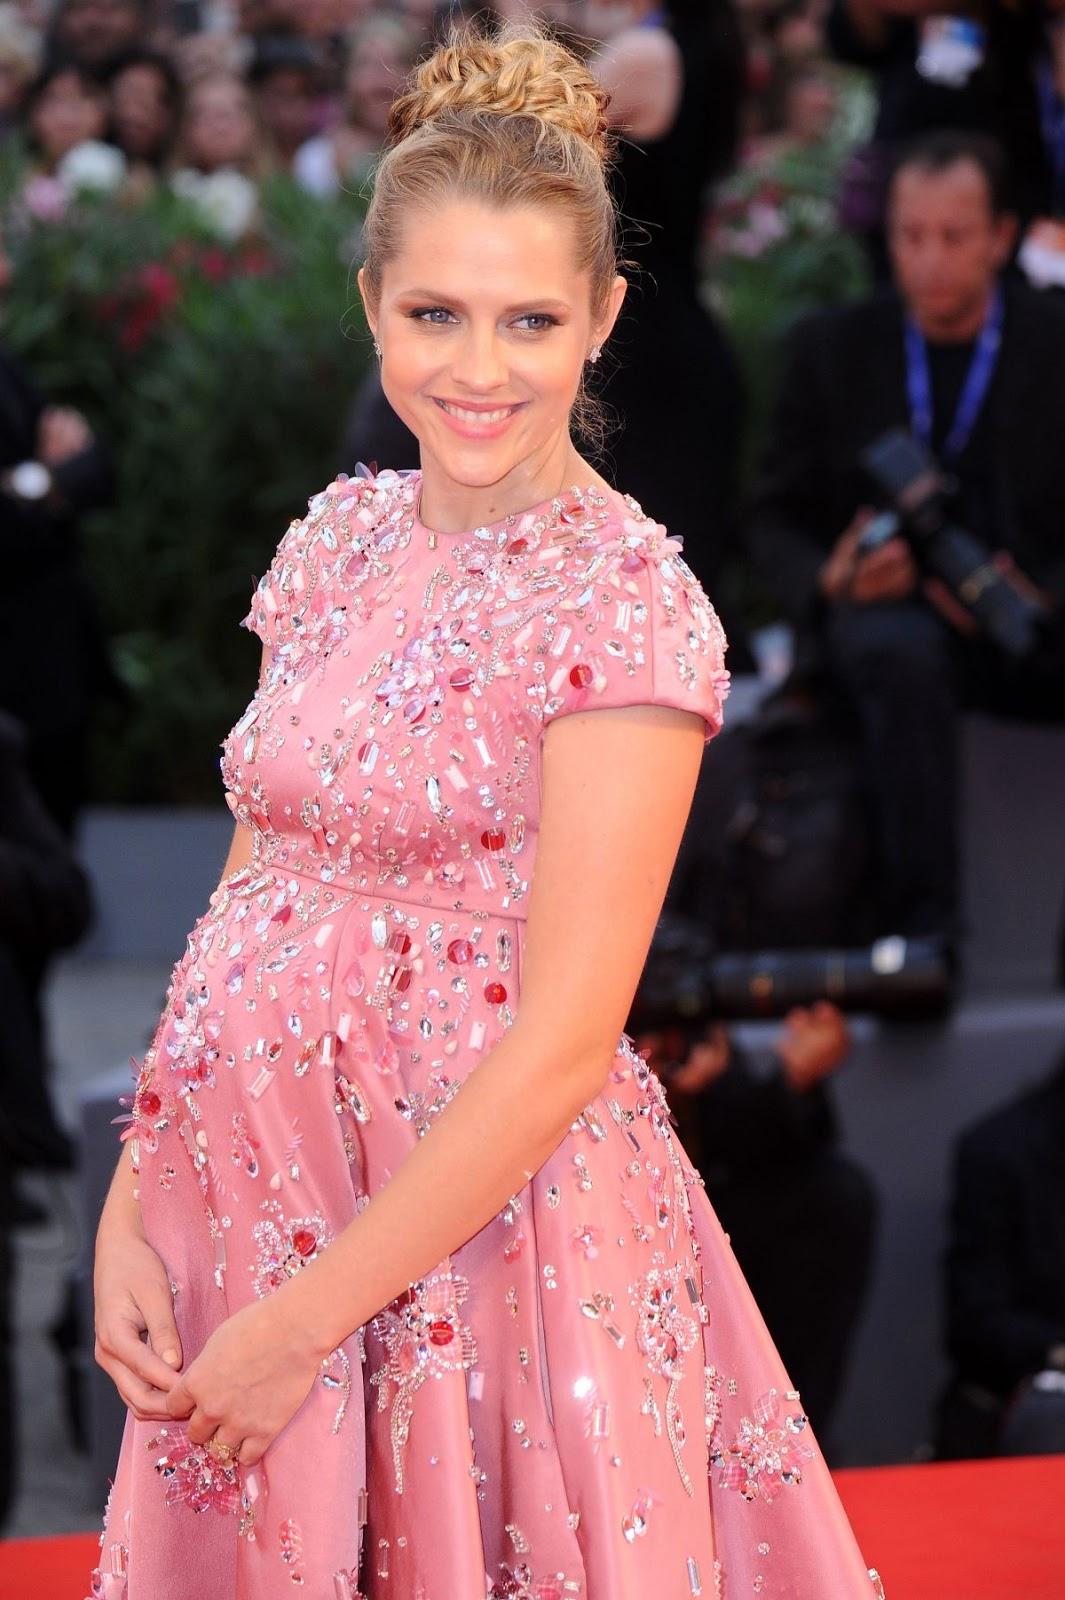 HQ Photos of Pregnant Teresa Palmer at Hacksaw Ridge Premiere At 2016 Venice Film Festival